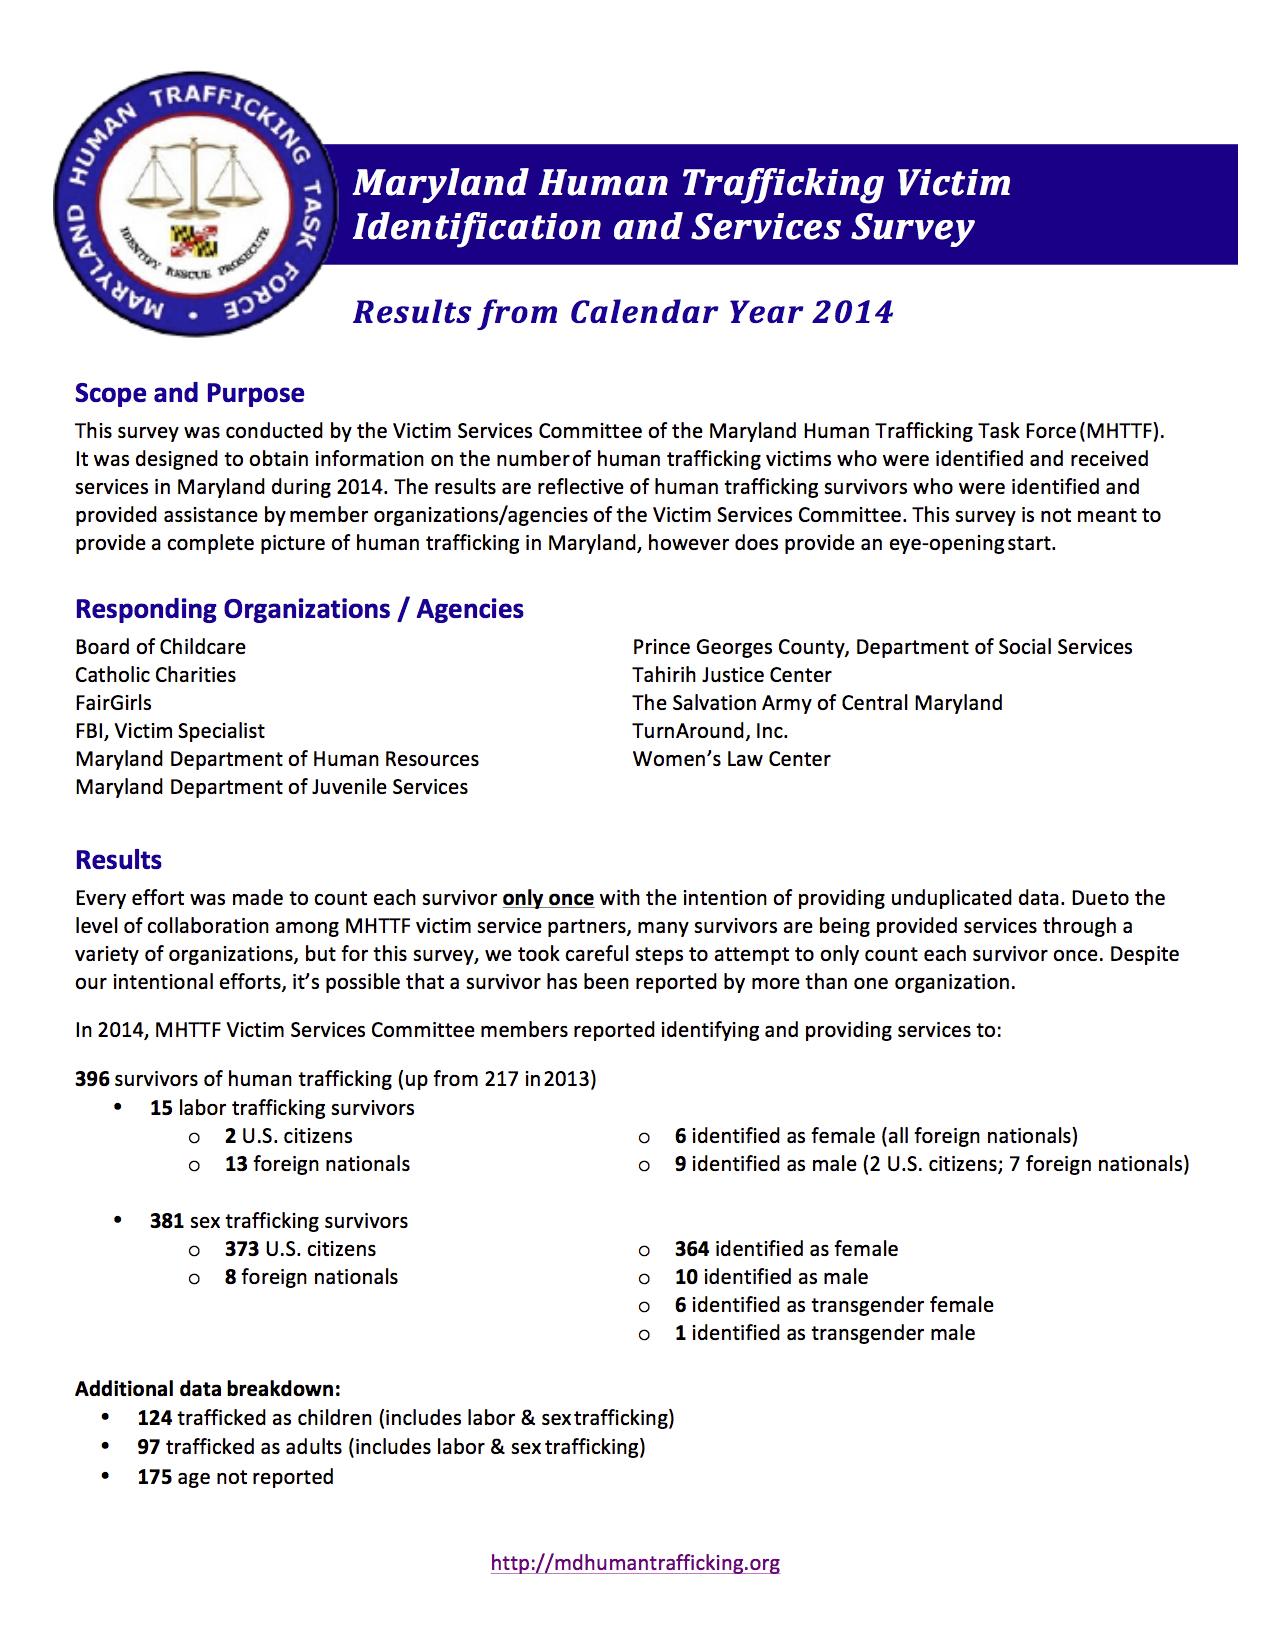 Maryland Human Trafficking Task Force